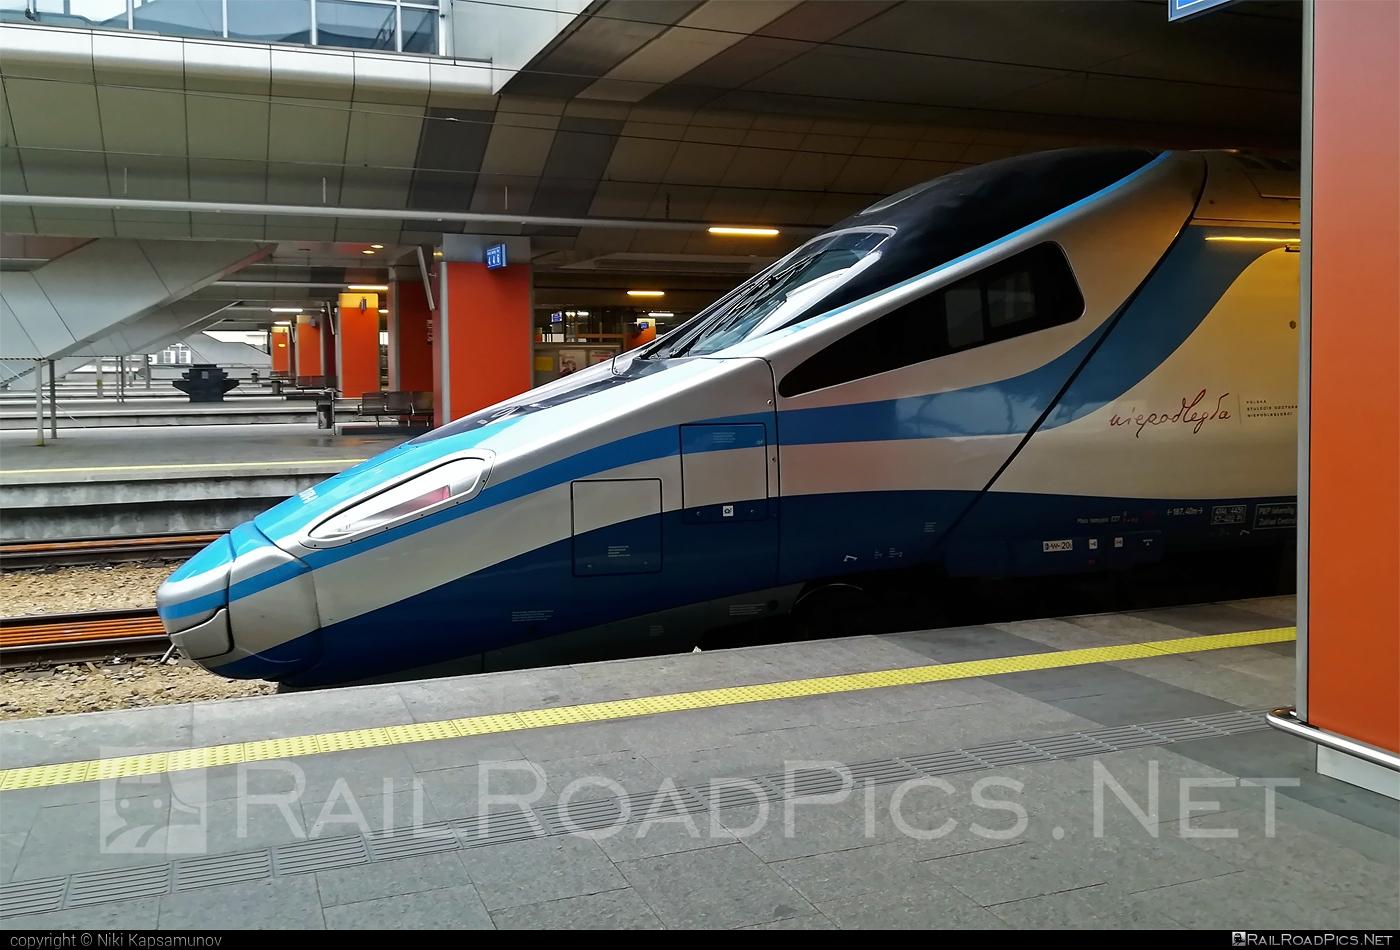 Alstom ED250 - 2 370 078-0 operated by PKP INTERCITY S.A. #alstom #alstomed250 #newpendolino #pendolino #pkp